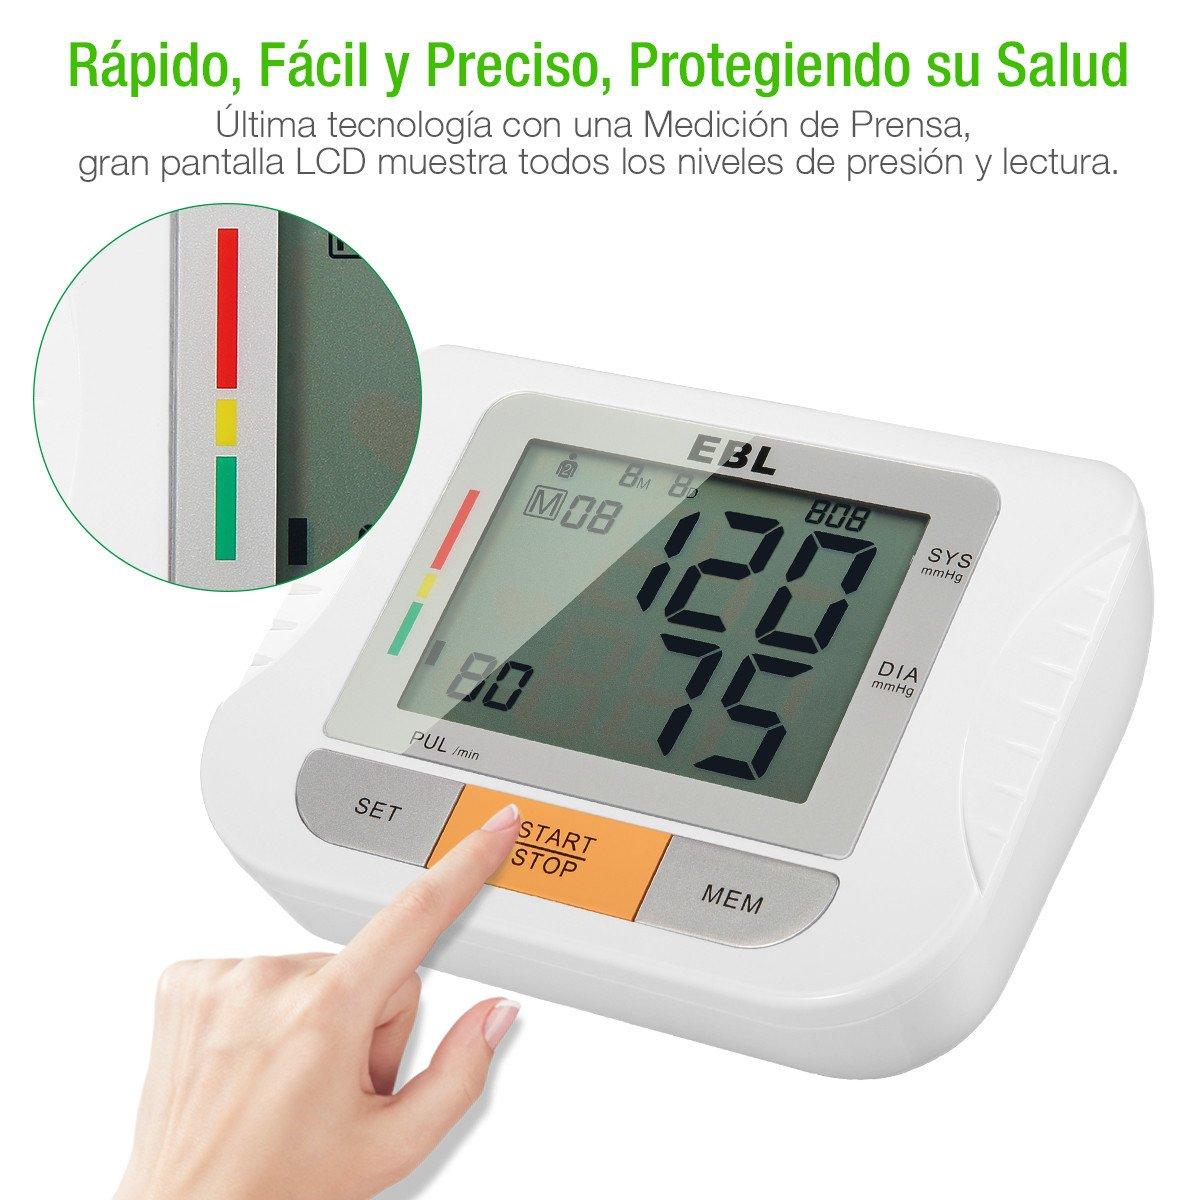 EBL Tensiómetro de Brazo Digital, LCD Pantalla para Lectura Fácil Función de Memoria Uso Doméstico Fino con CE & RoHS ,2 Personas Memoria para 90 Lecturas, ...